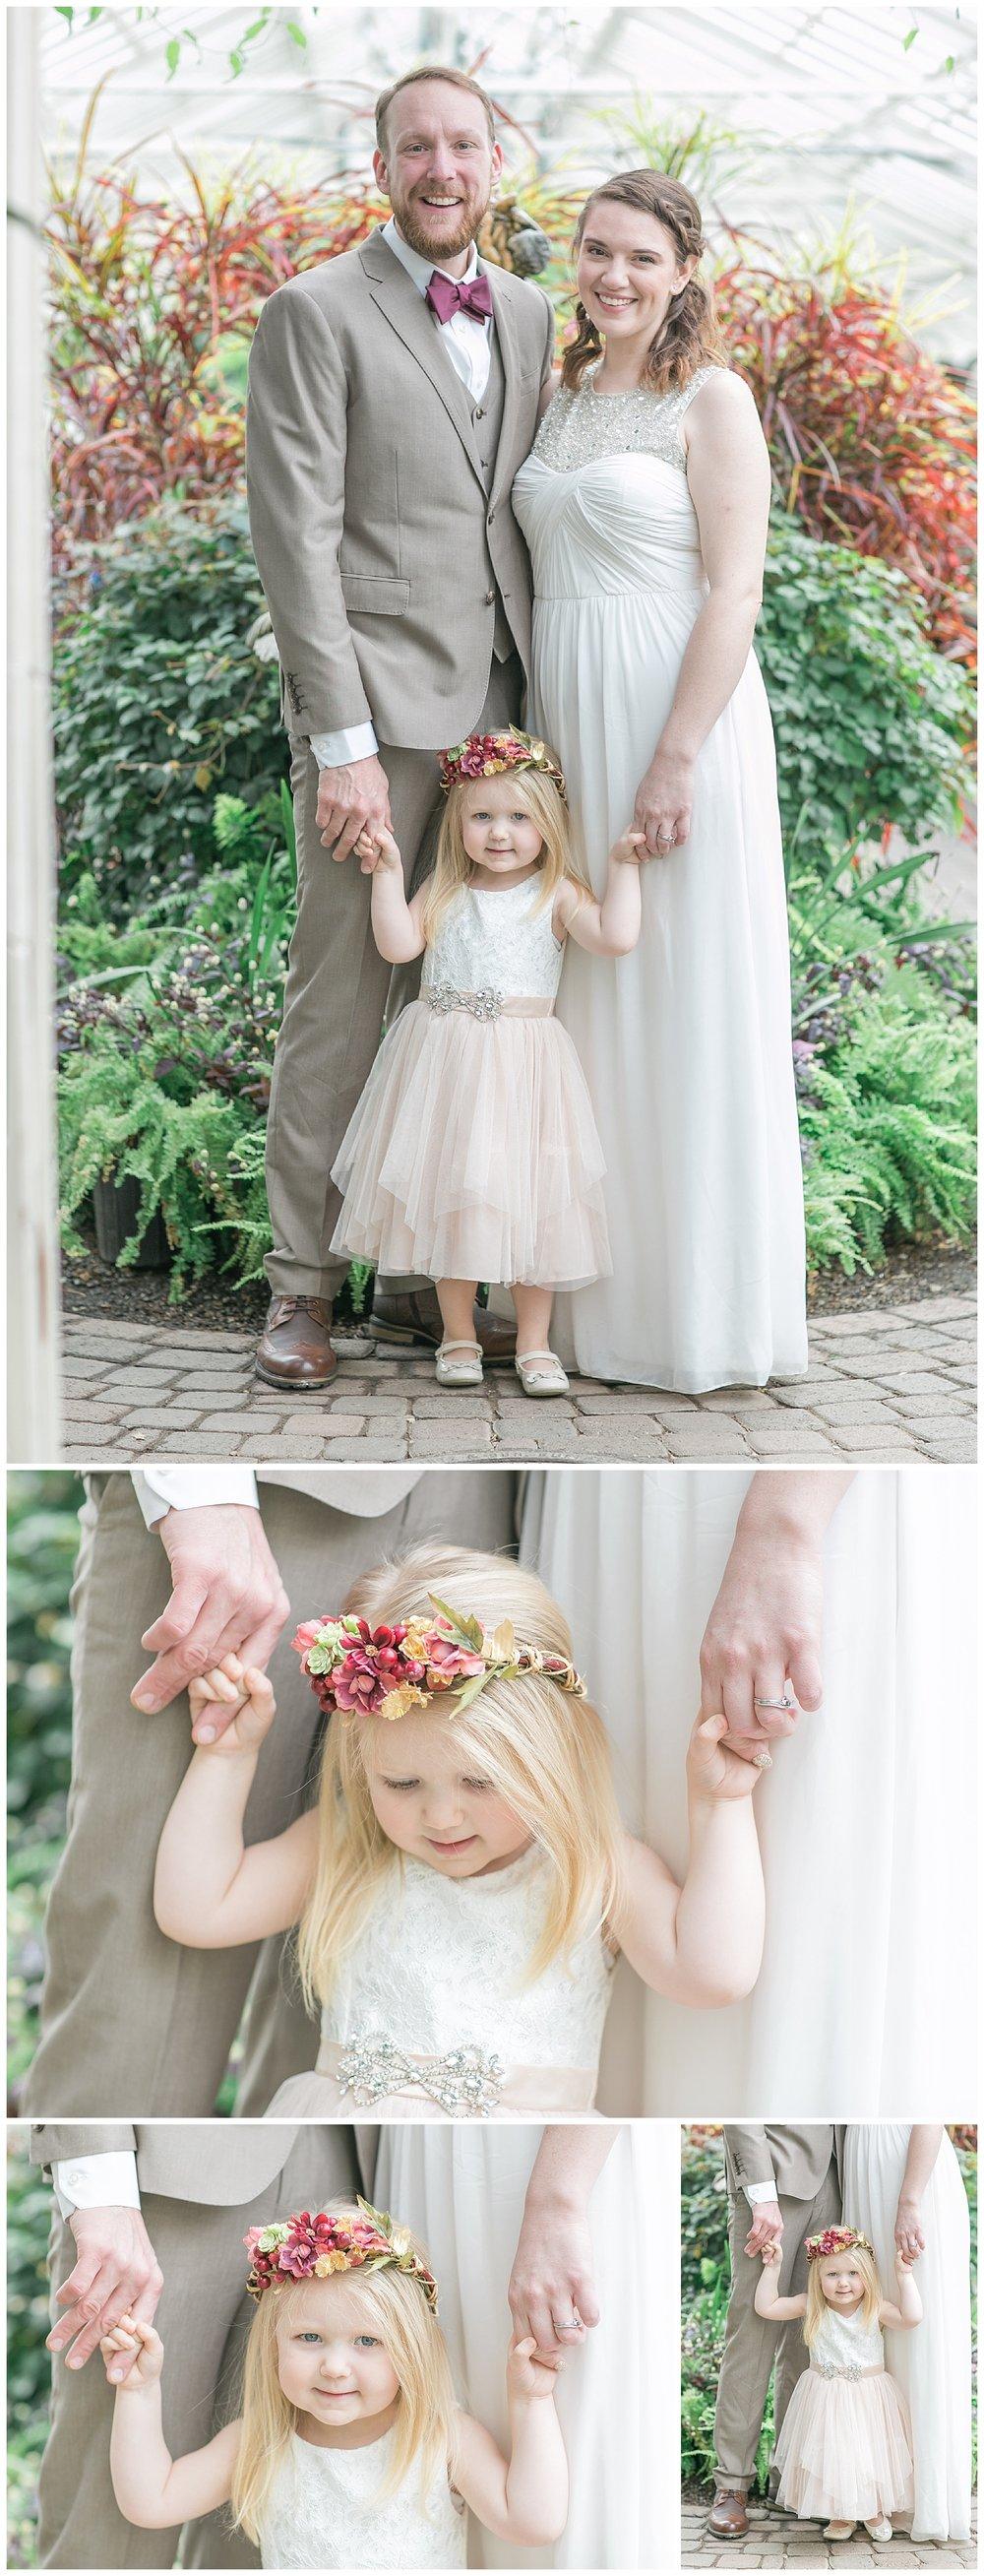 Buffalo Botanical gardens wedding - Buffalo NY Lass and Beau 7.jpg